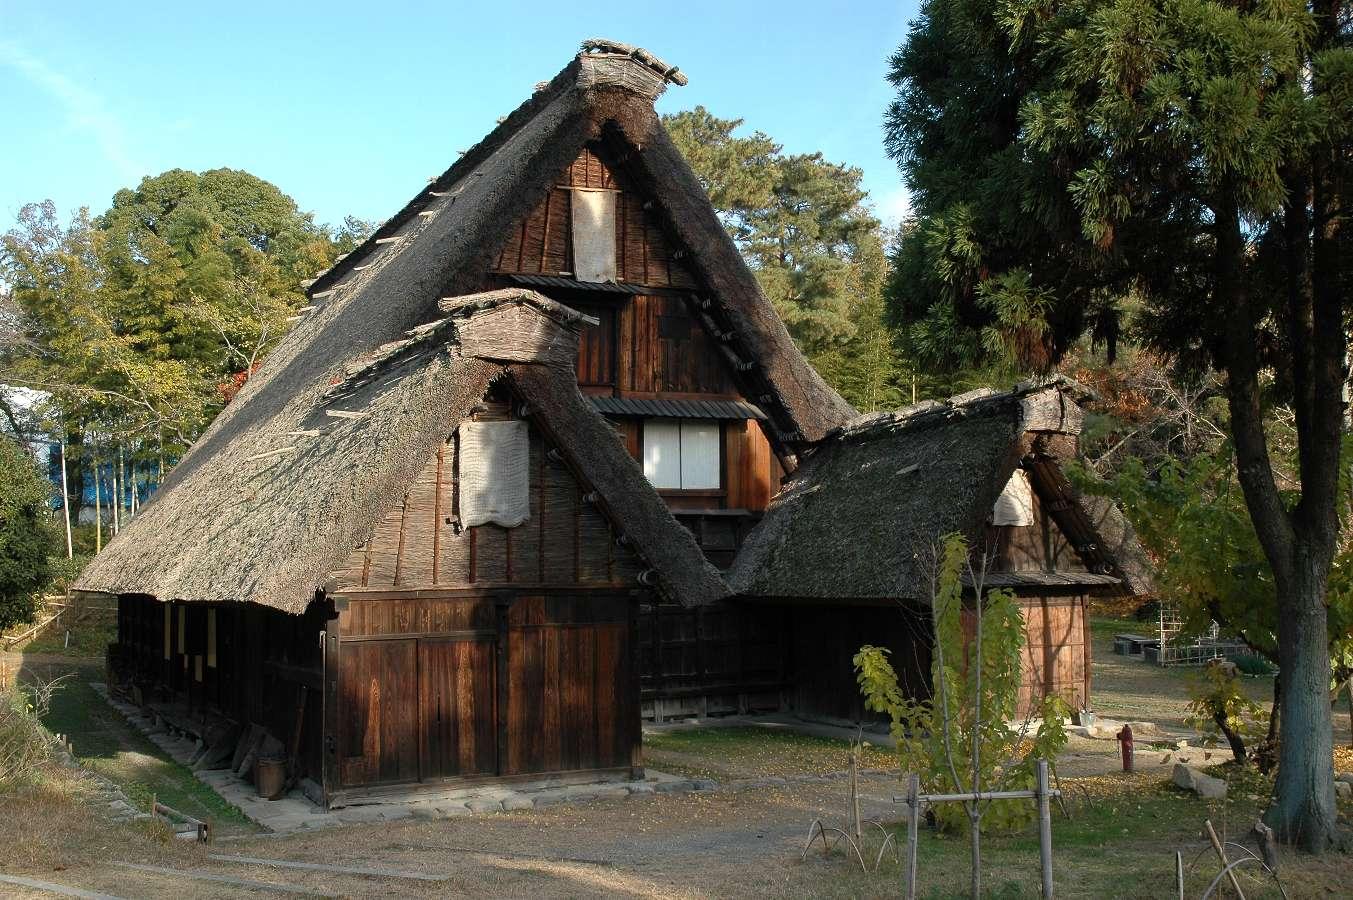 日本民家集落へ_b0069128_019740.jpg